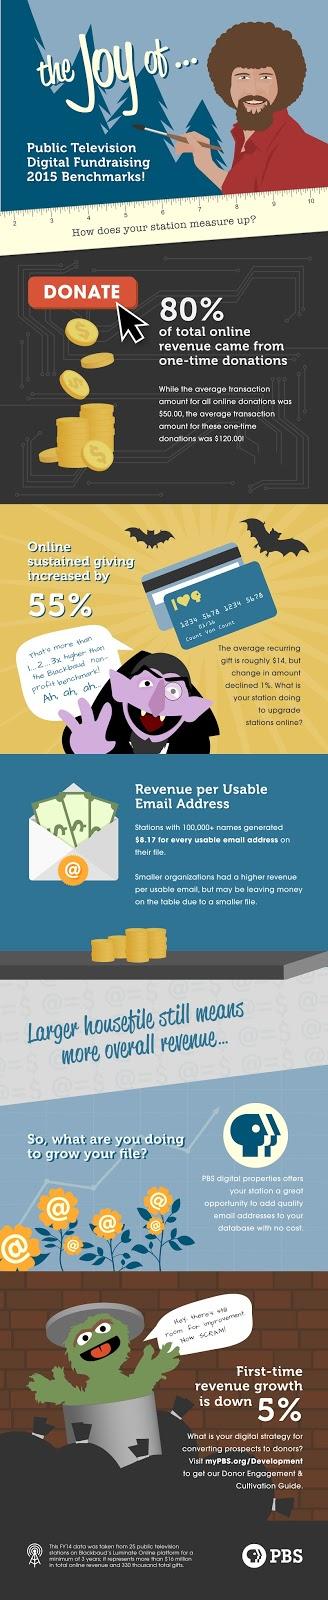 PBS Benchmark Infographic (300ppi).jpg